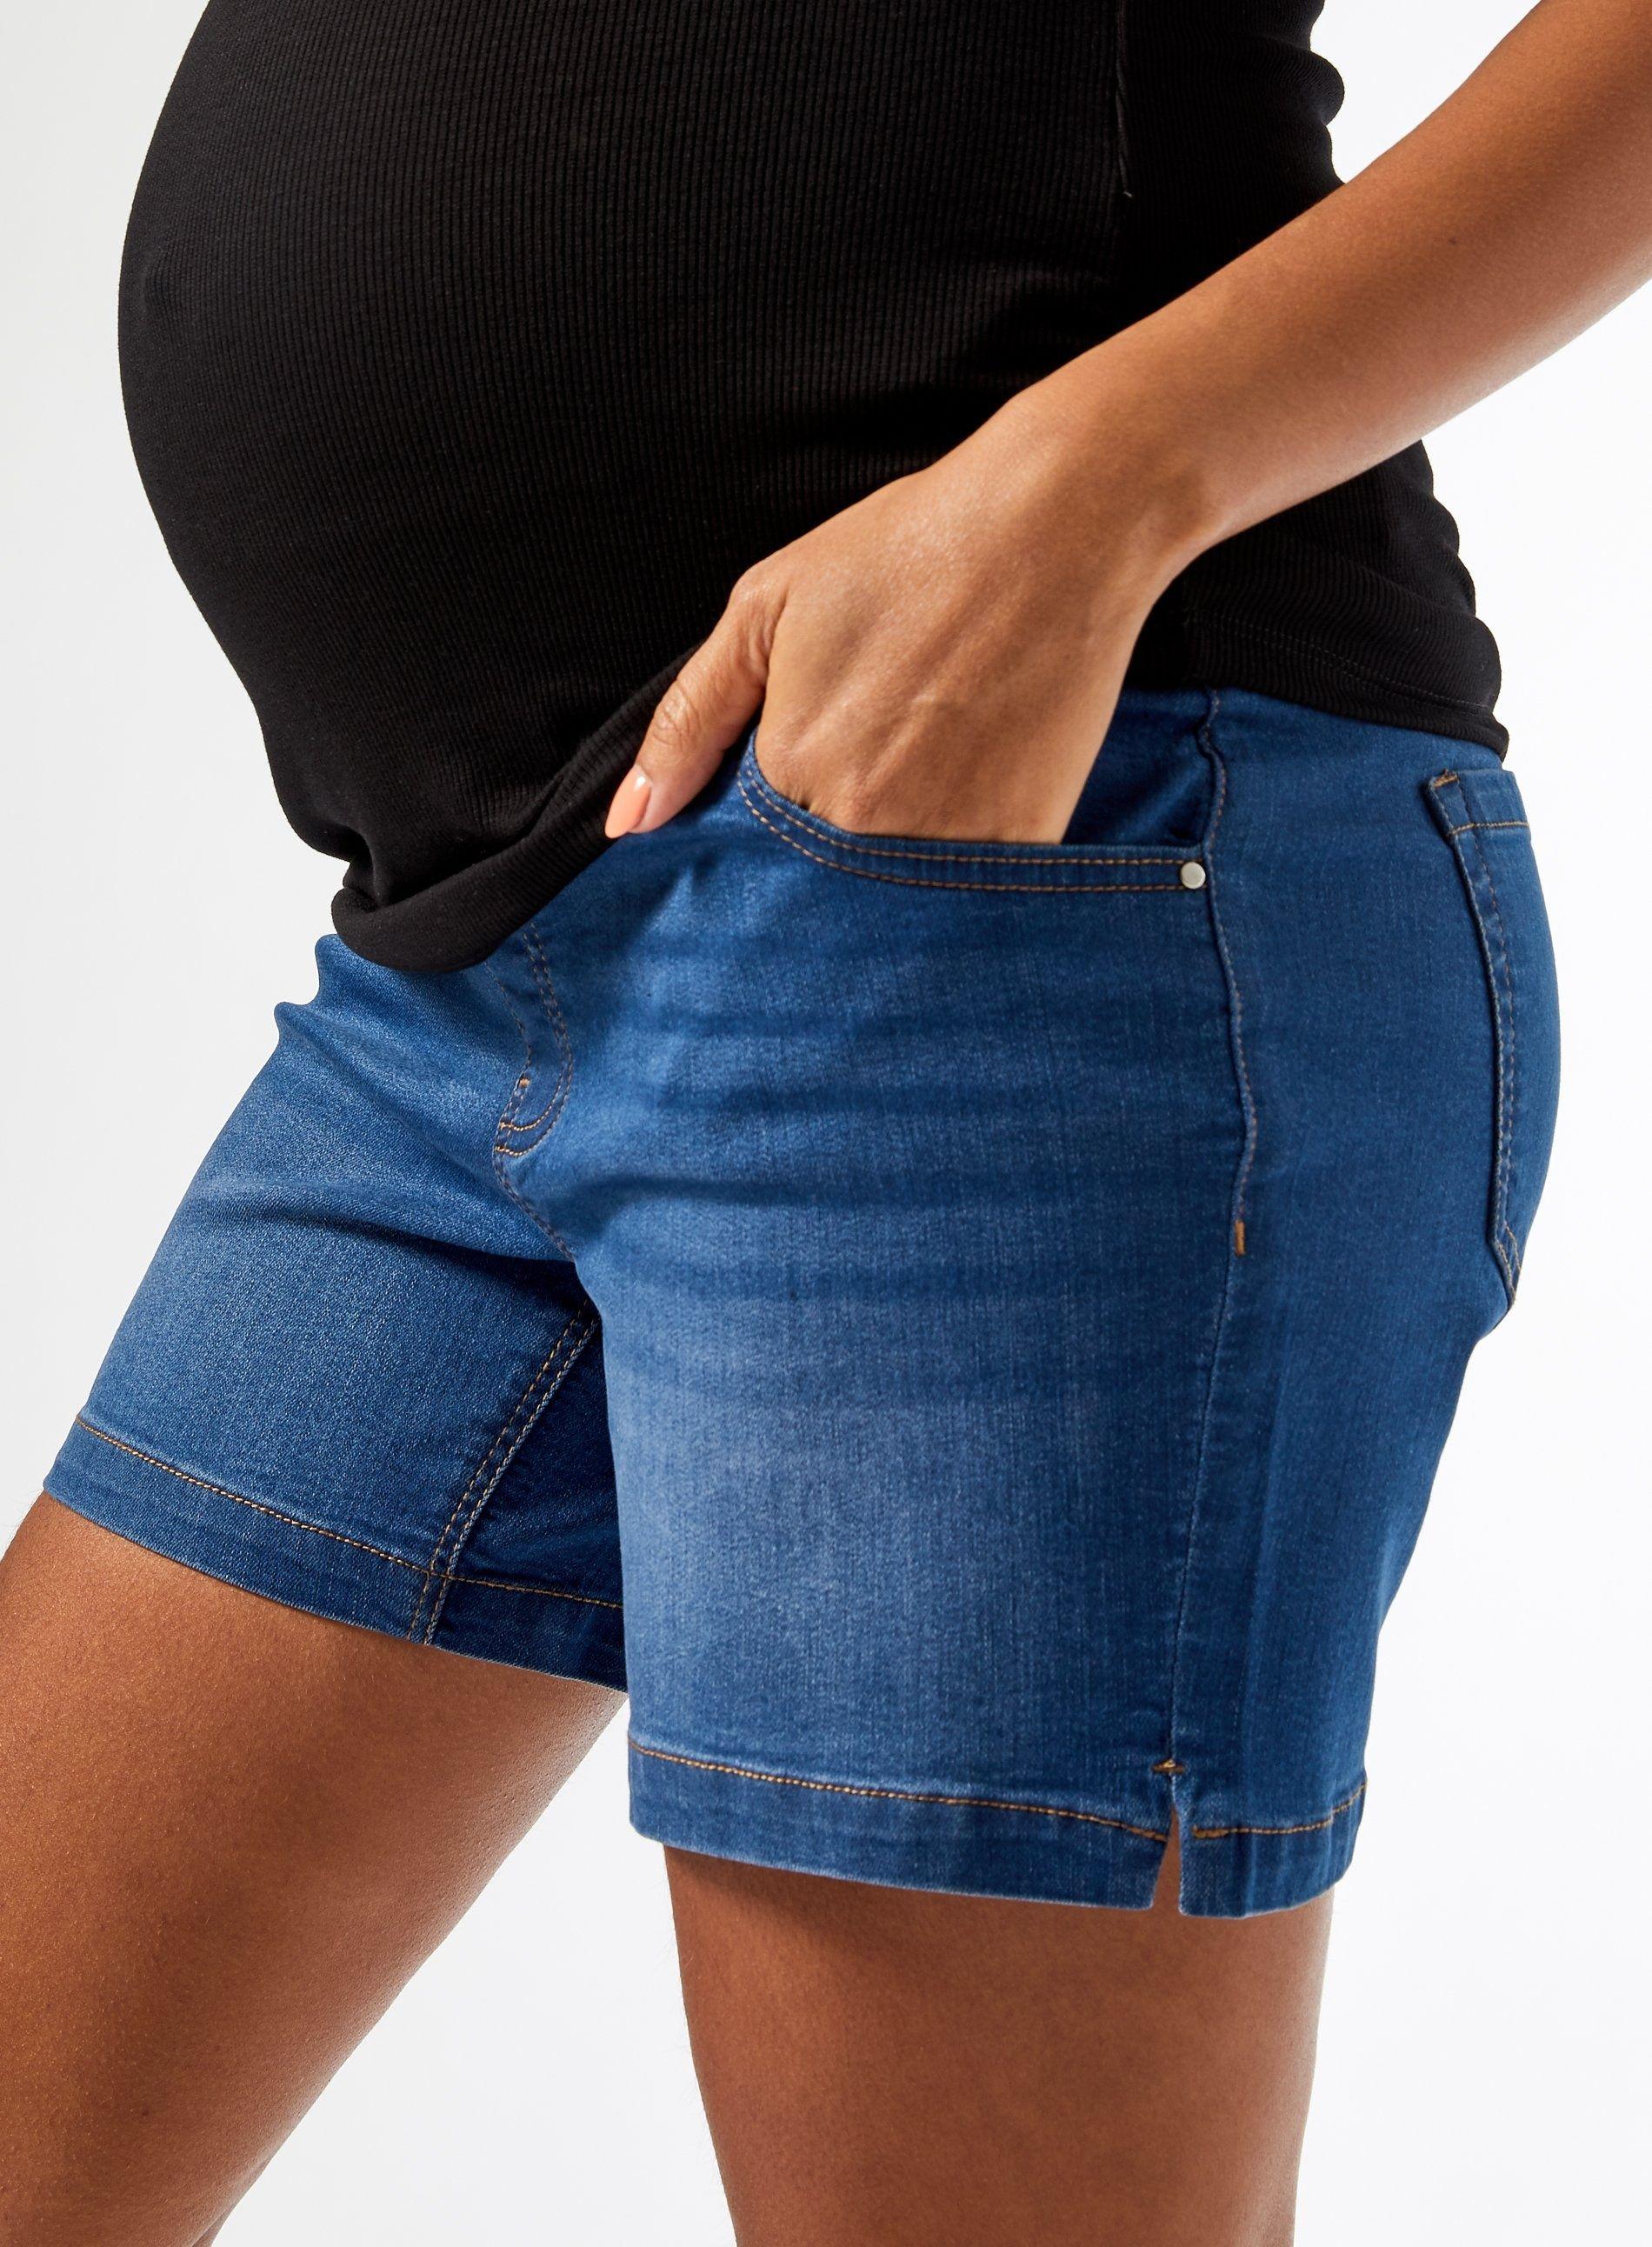 Dorothy Perkins Womens Maternity Mid Wash Denim Shorts Under Bump Bottoms